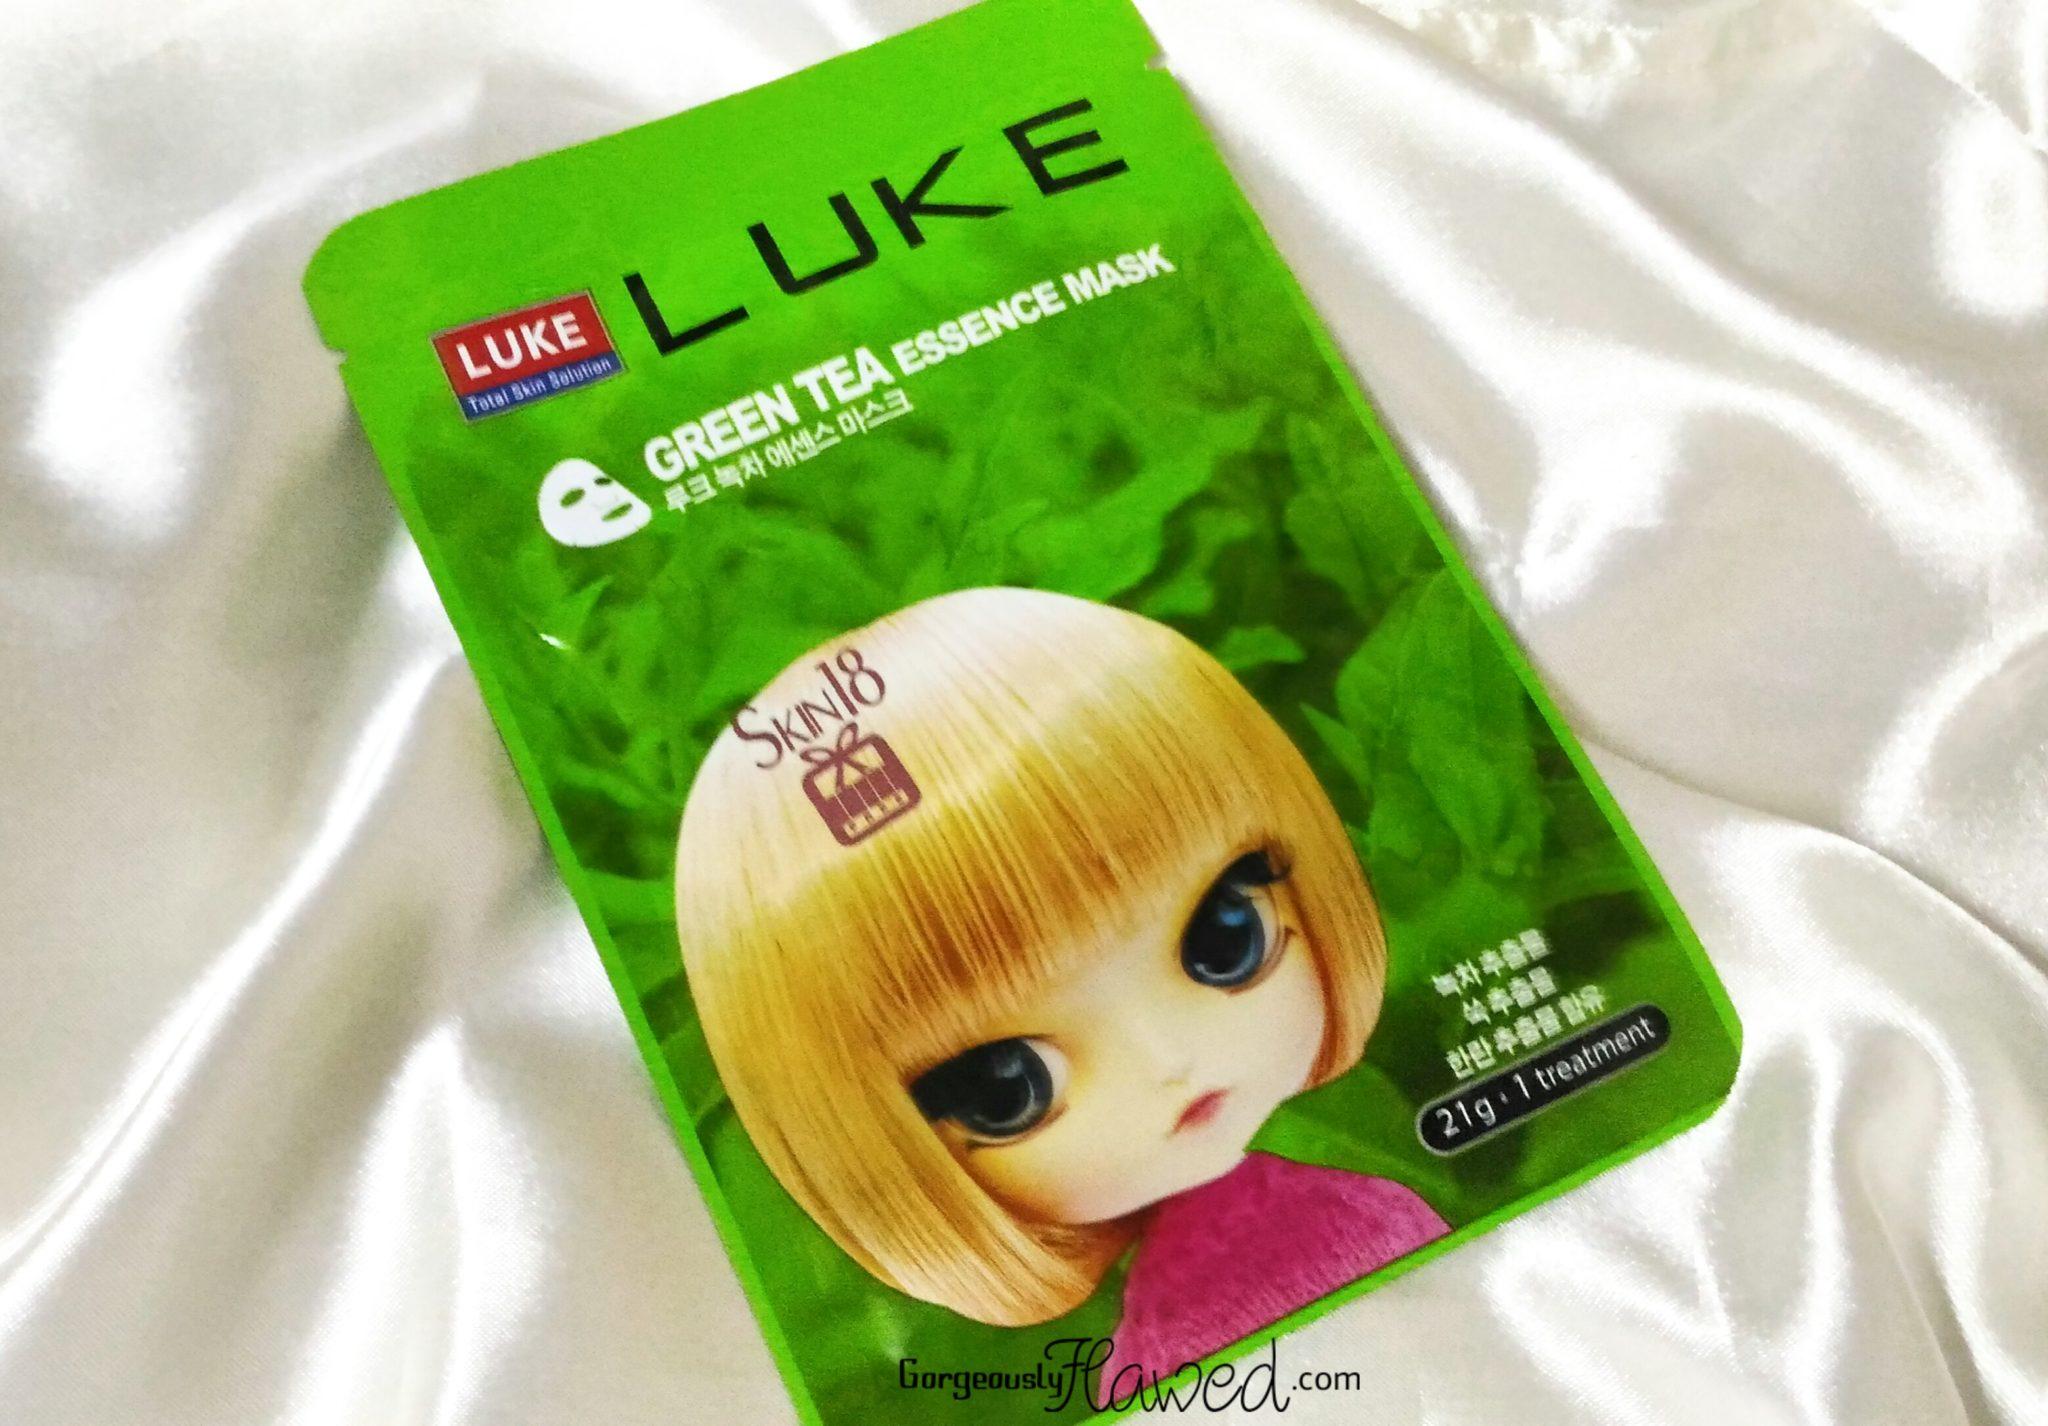 Luke Green Tea Essence Mask